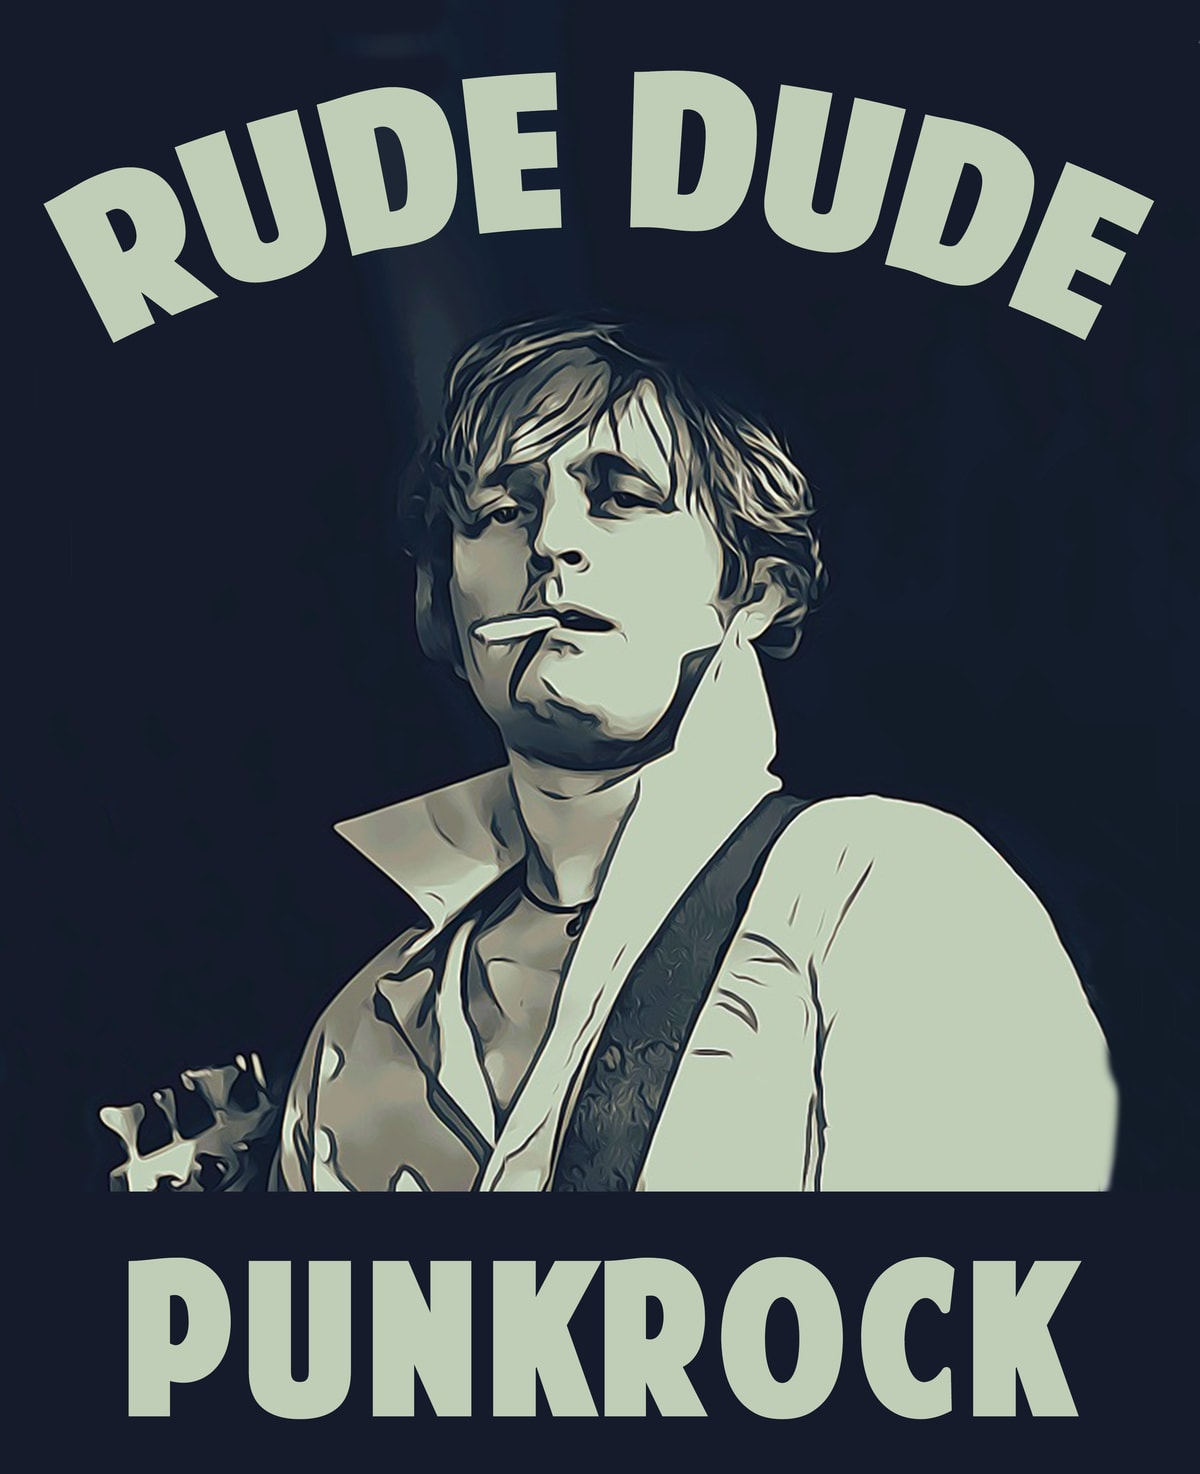 Rude Dude Shirt Layout